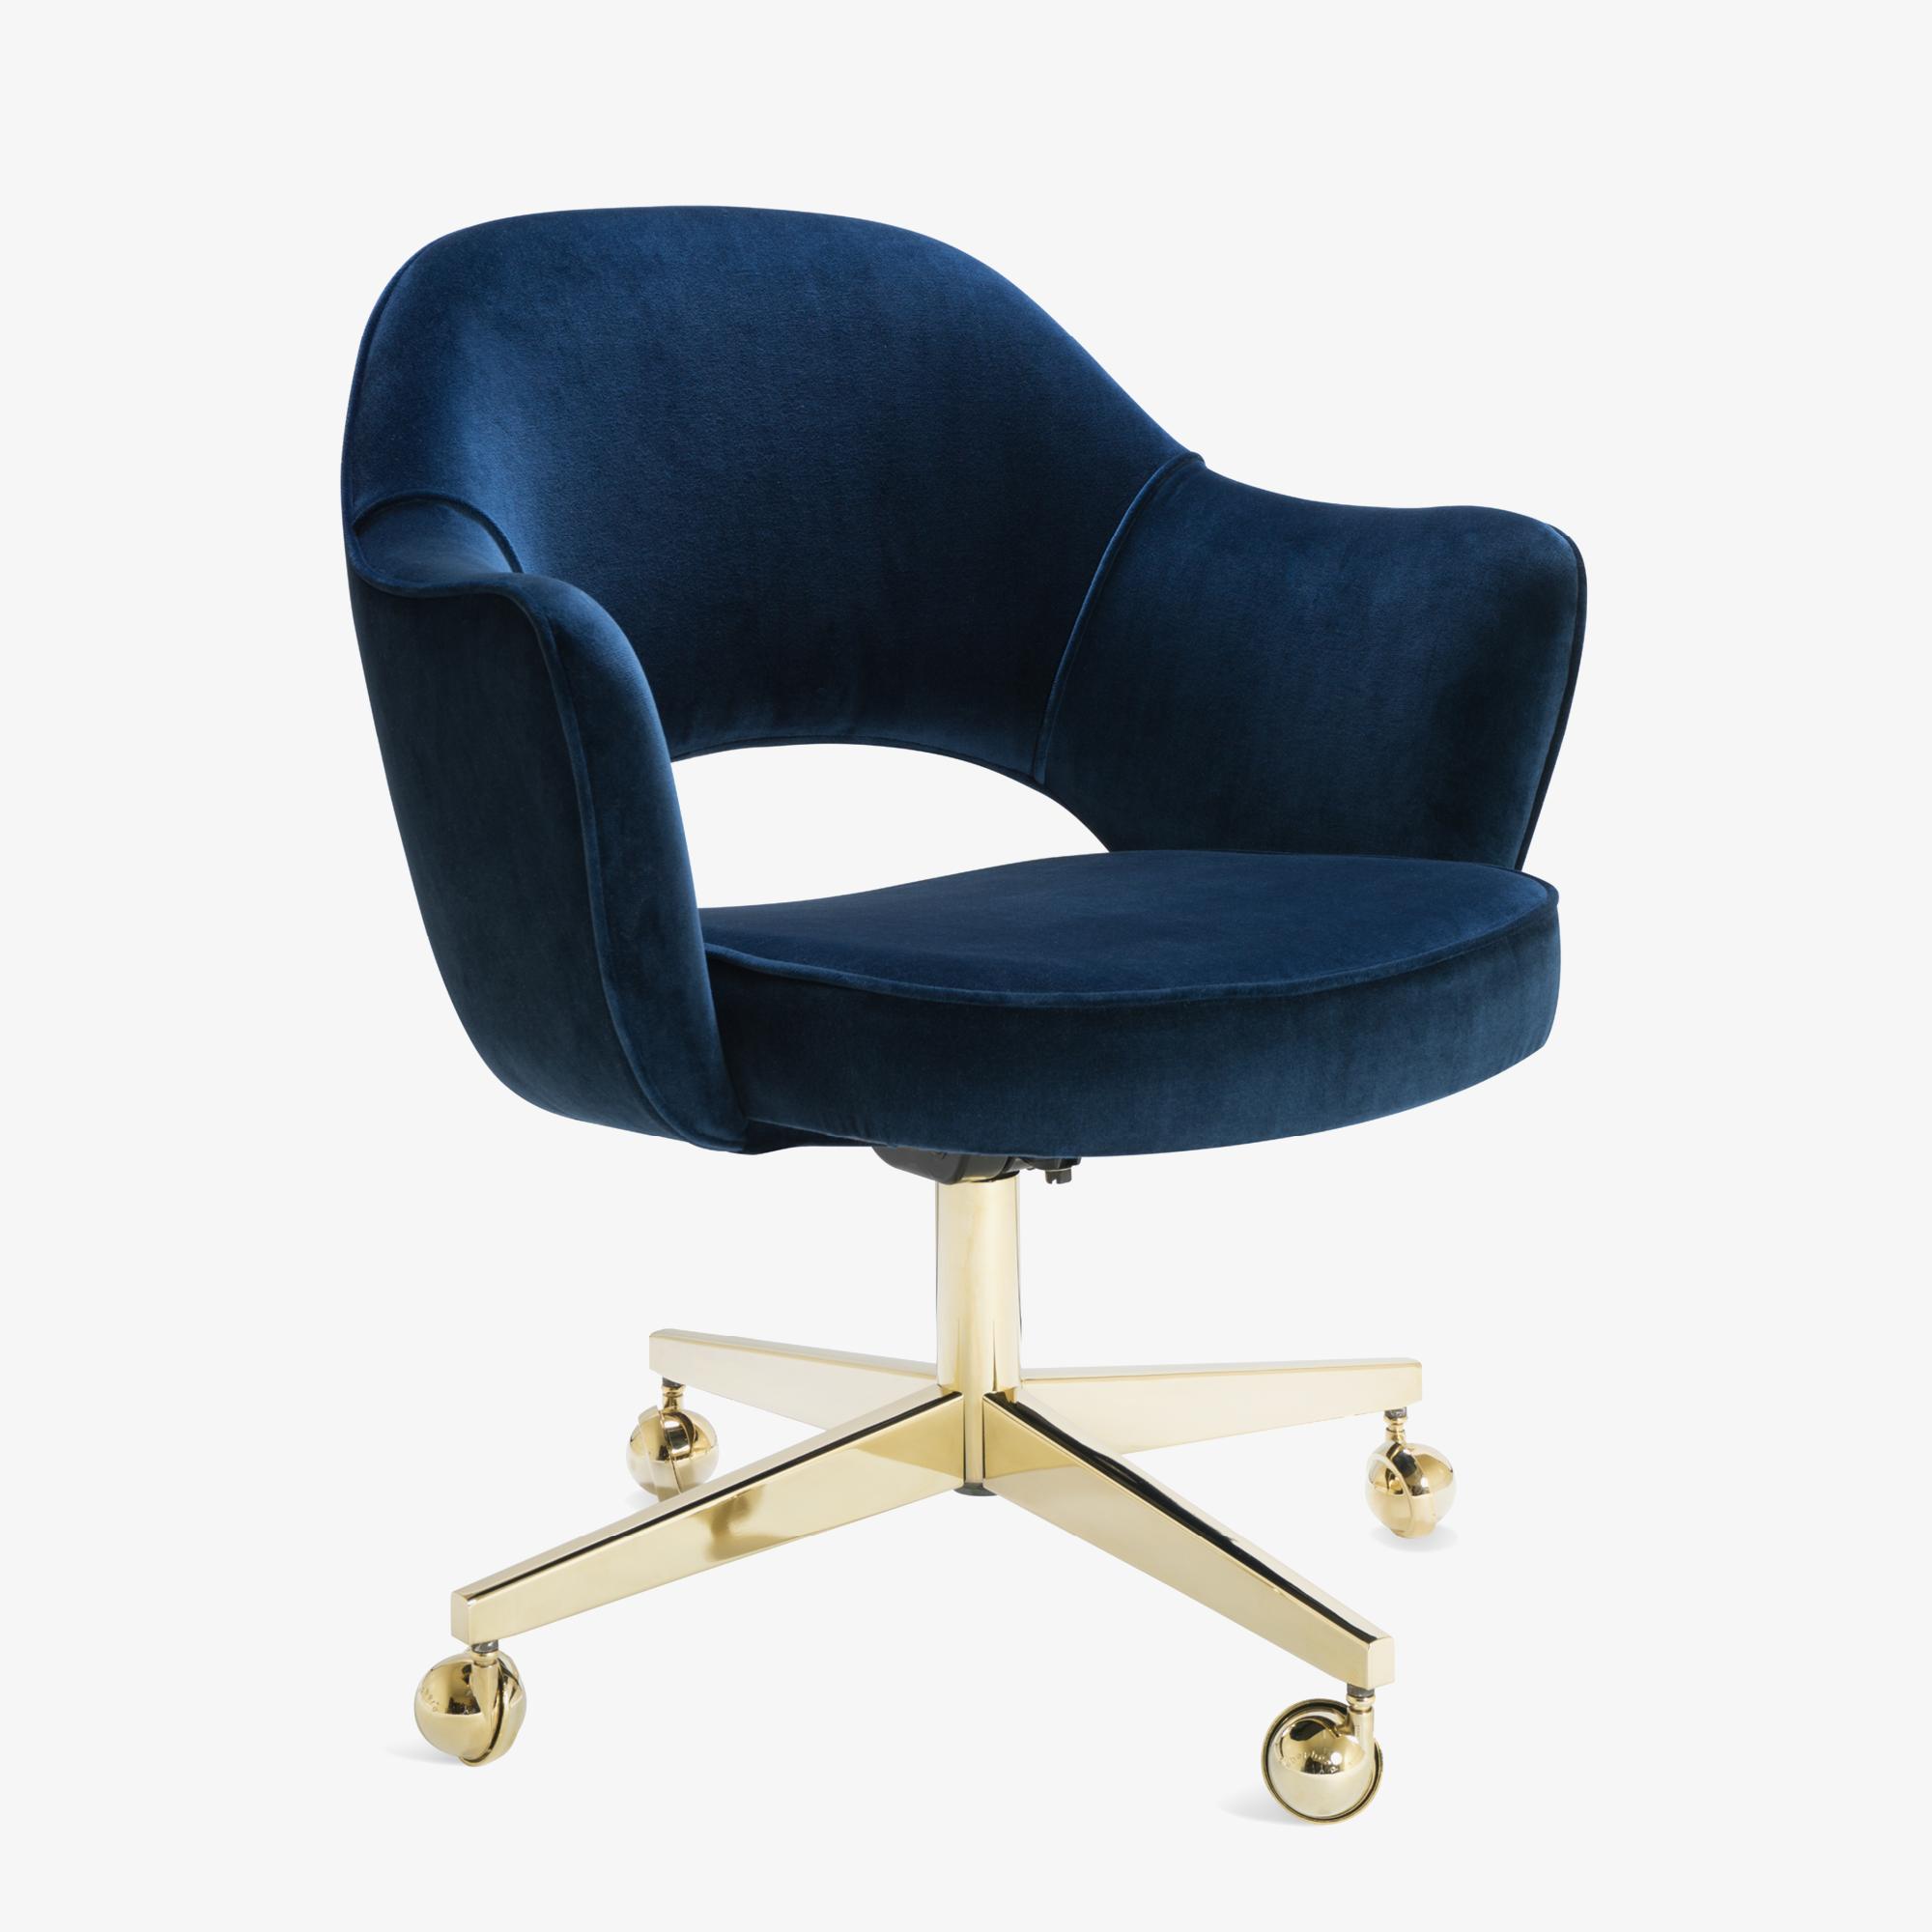 Saarinen Executive Arm Chair in Navy Velvet, Swivel Base, 24k Gold Edition3.png